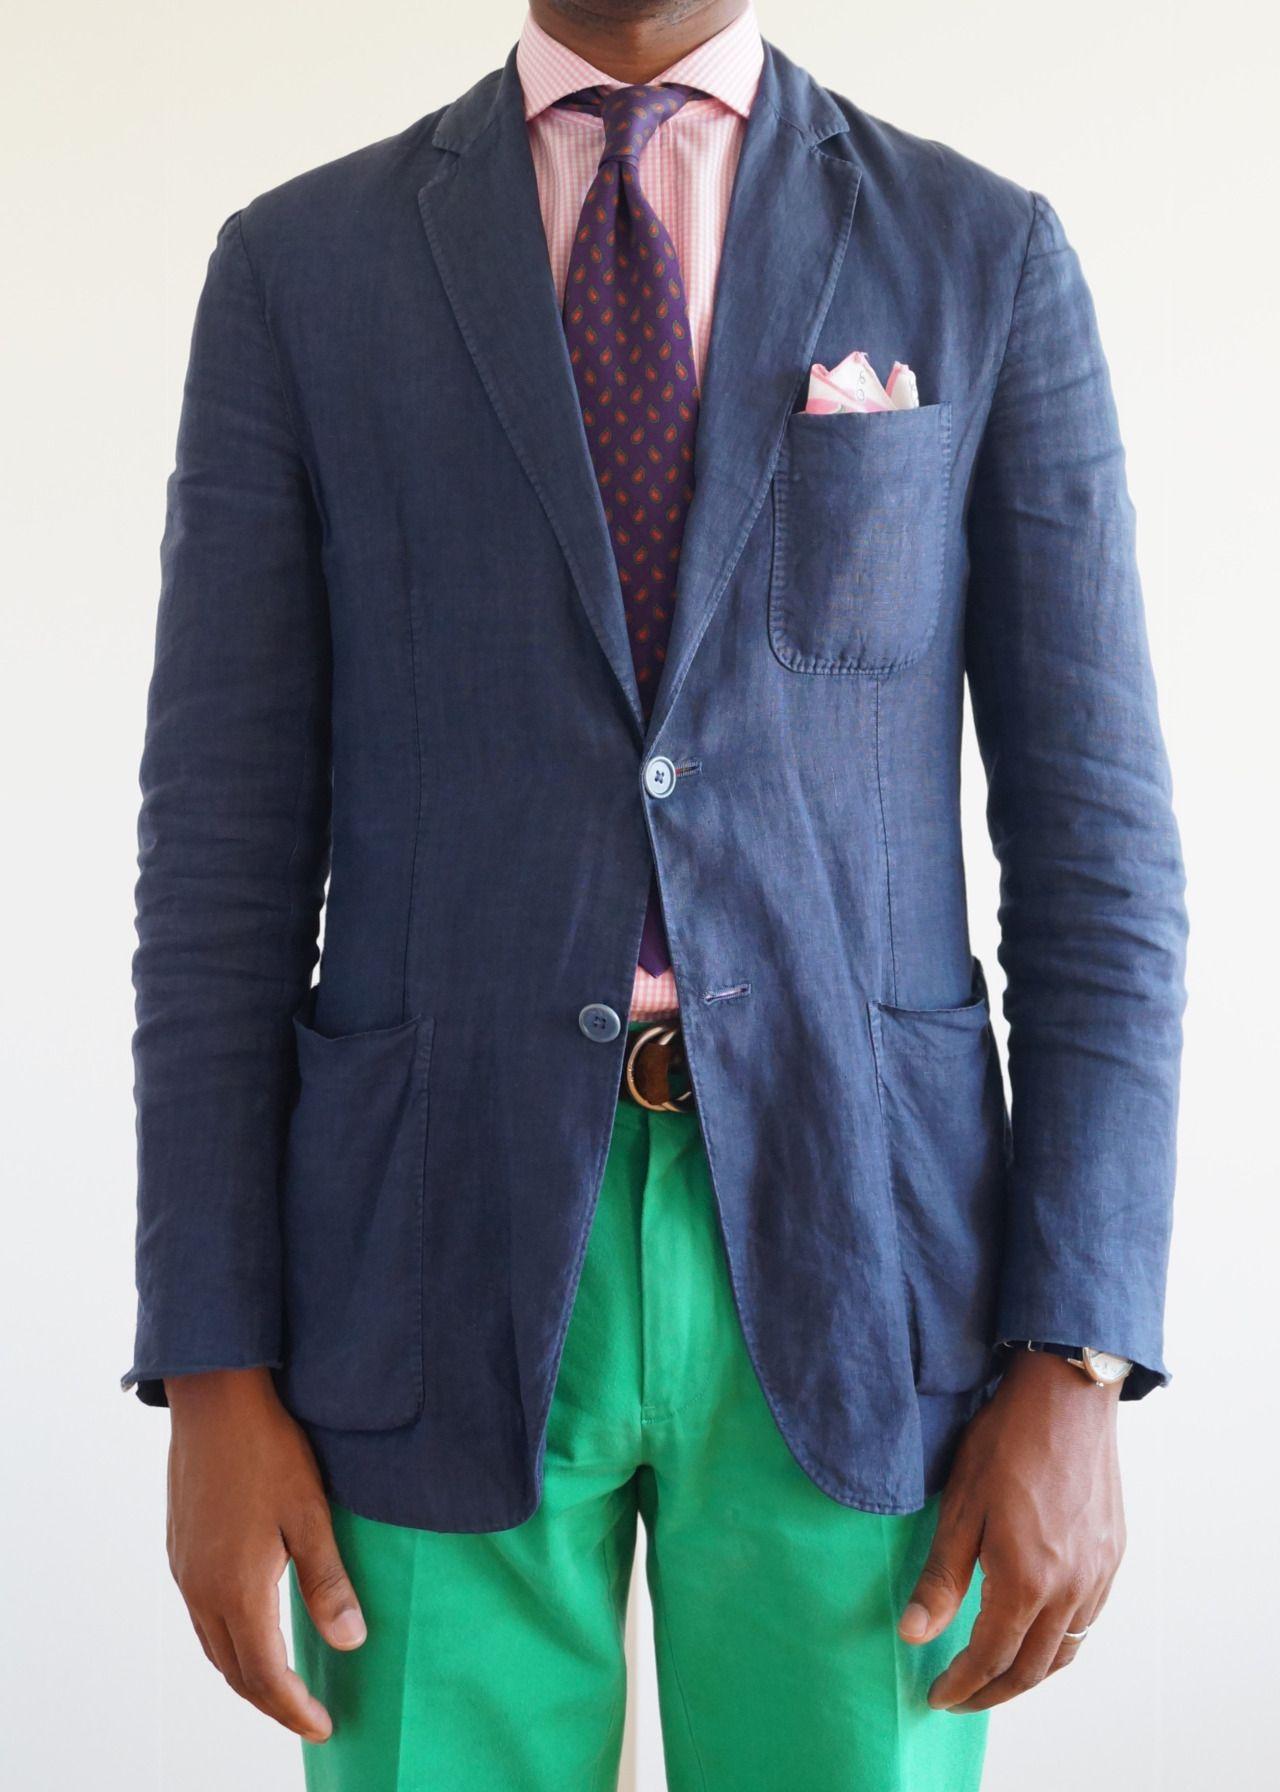 Navy blazer, pink shirt, purple tie with pink medallions